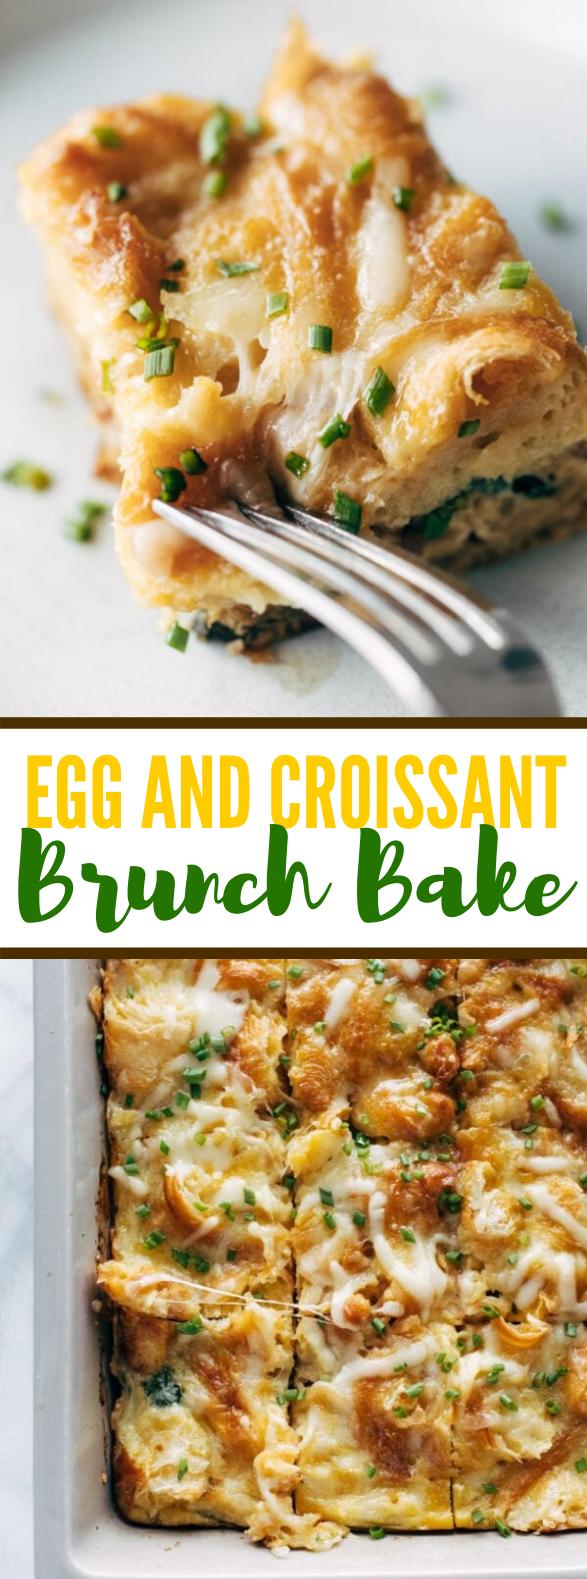 Egg and Croissant Brunch Bake #lunch #breakfast